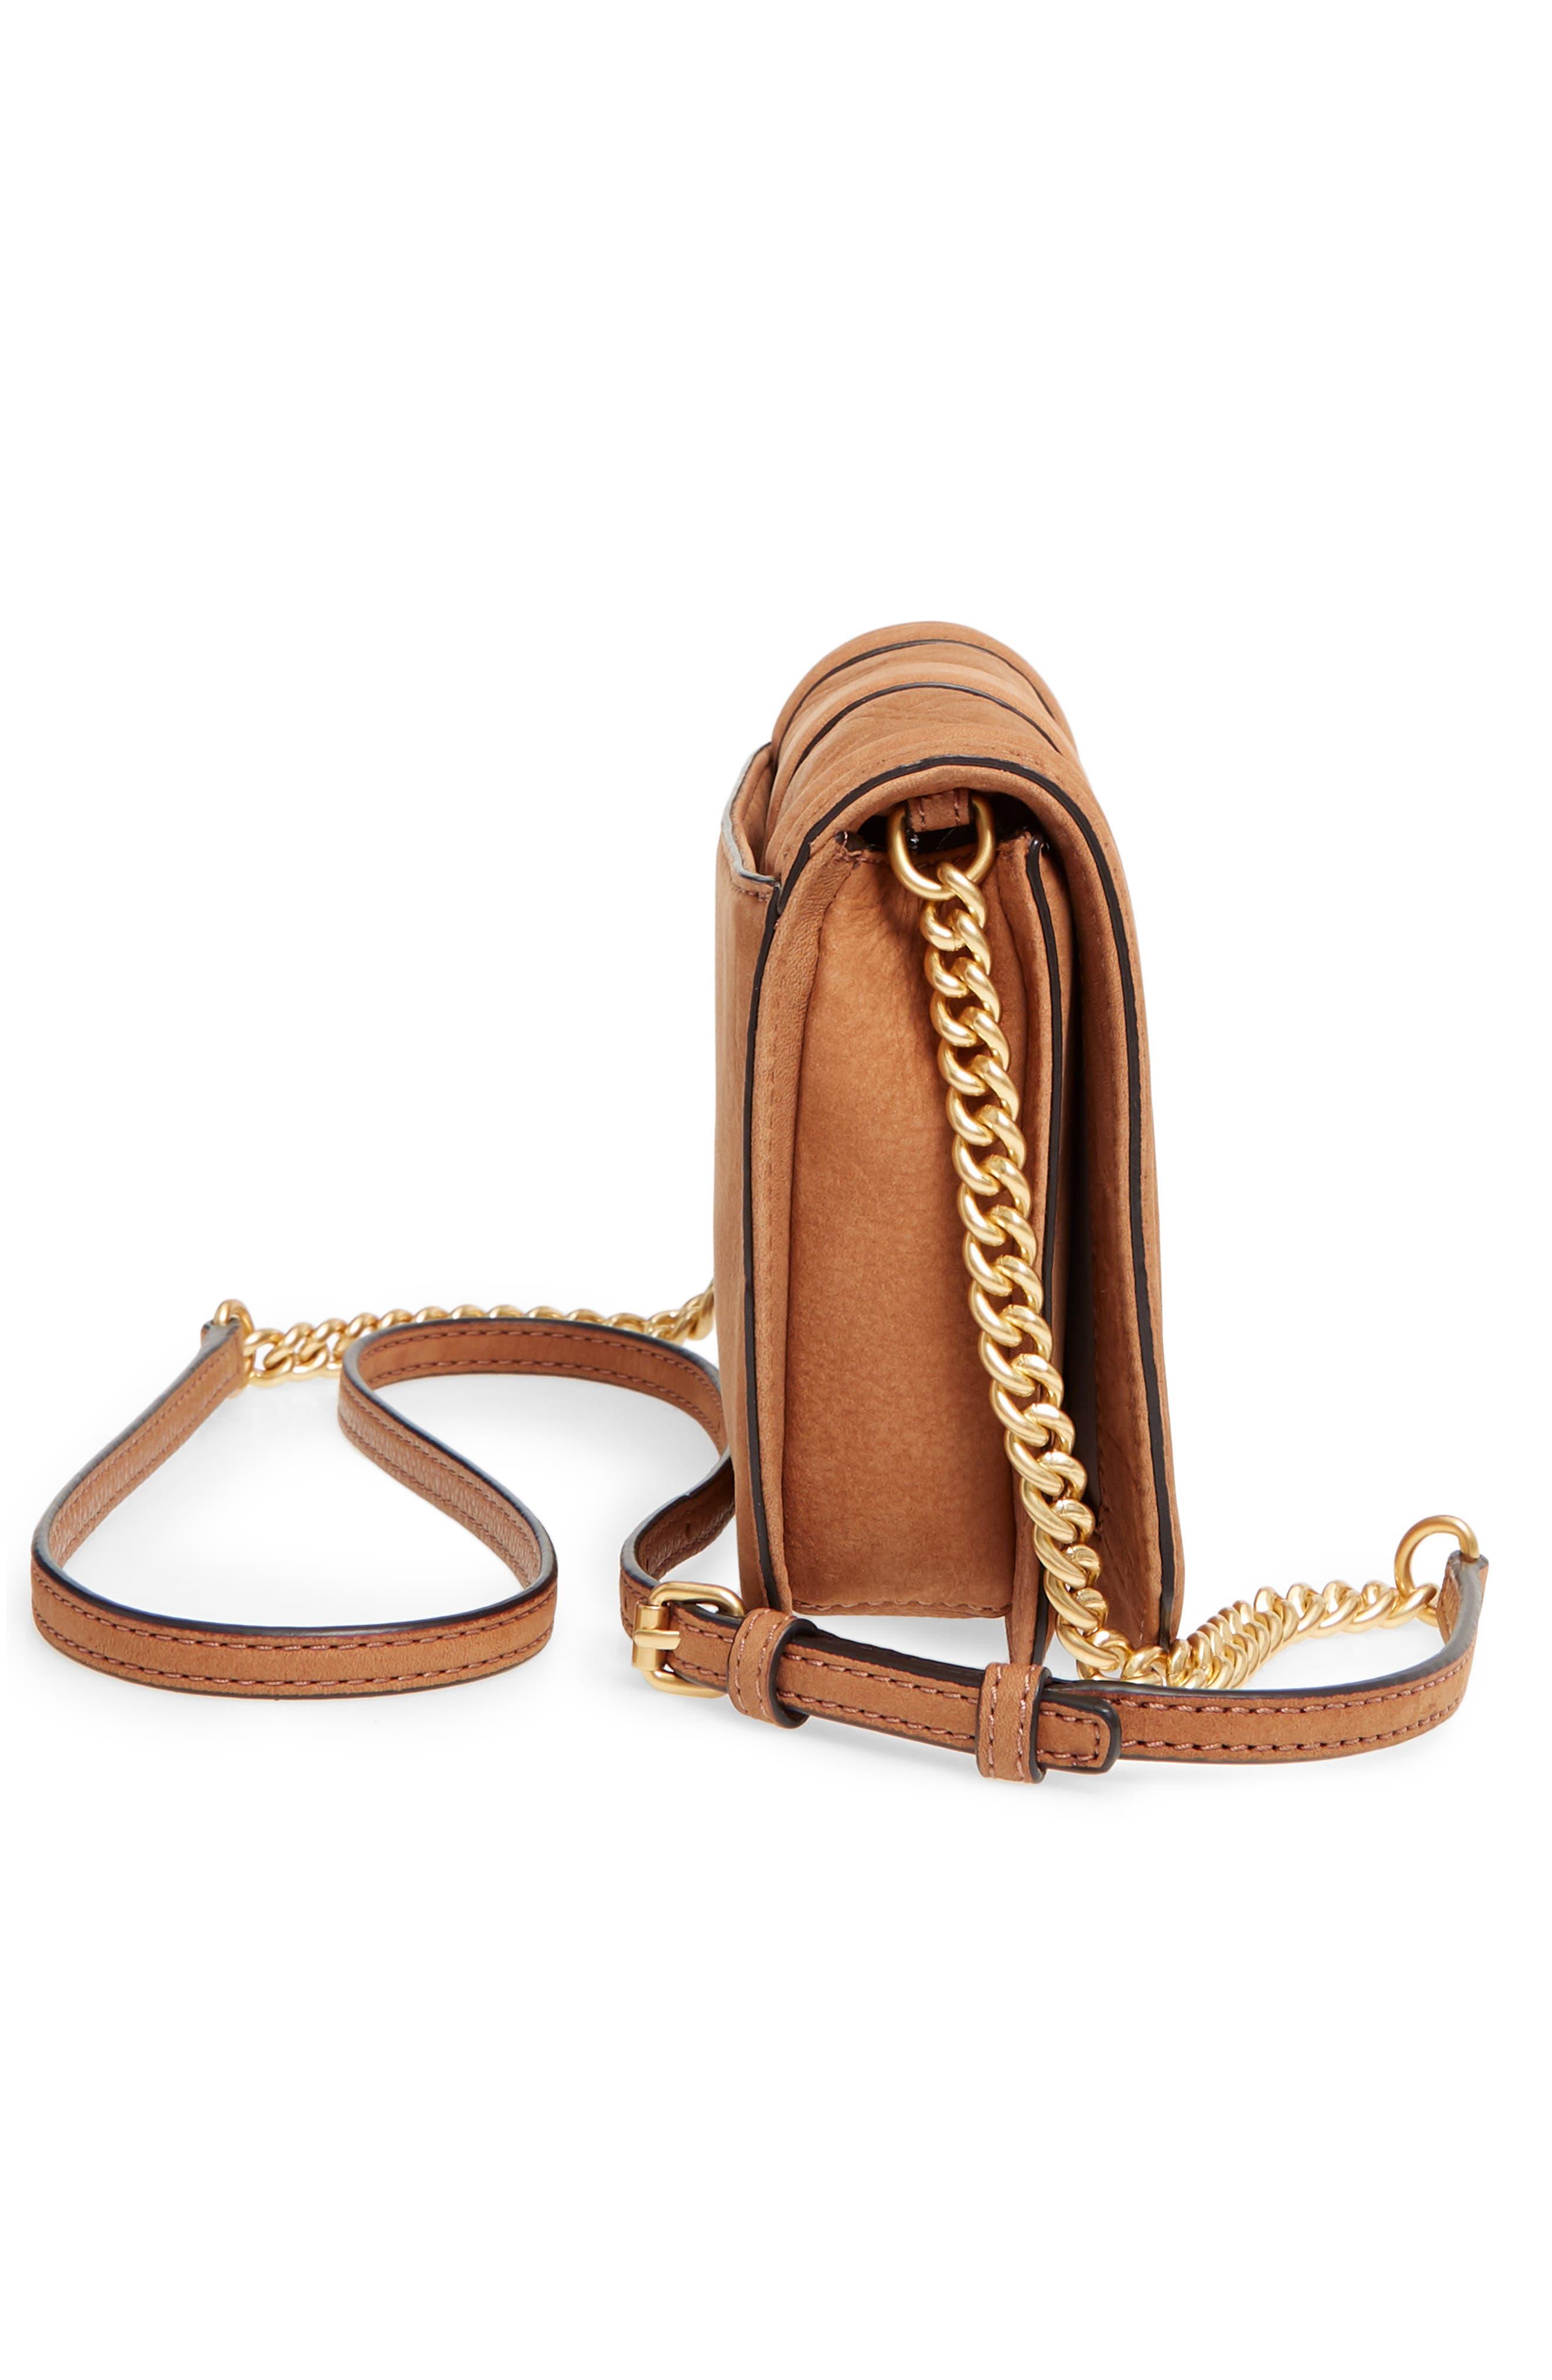 Small Love Nubuck Leather Crossbody Bag,                             Alternate thumbnail 6, color,                             Almond